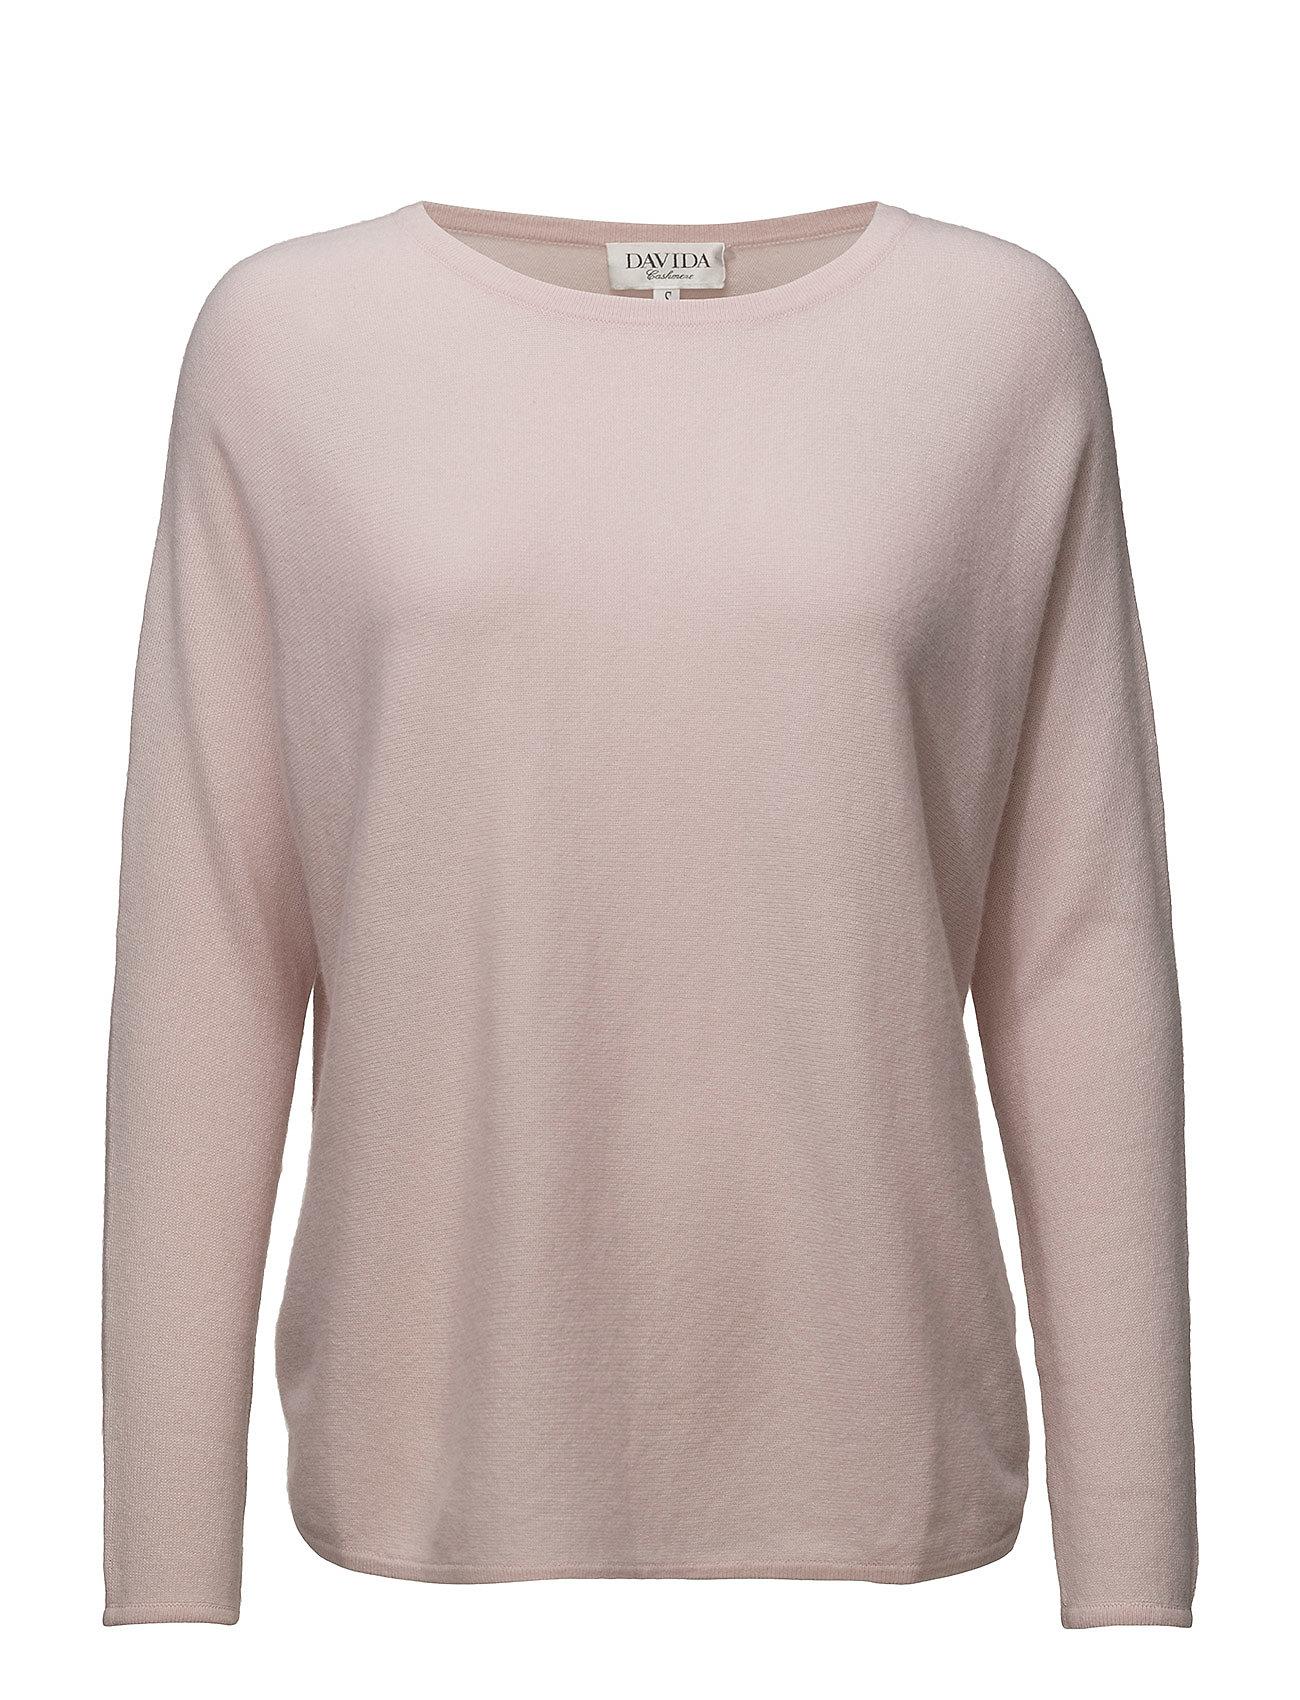 Davida Cashmere Curved Sweater - LIGHT PINK